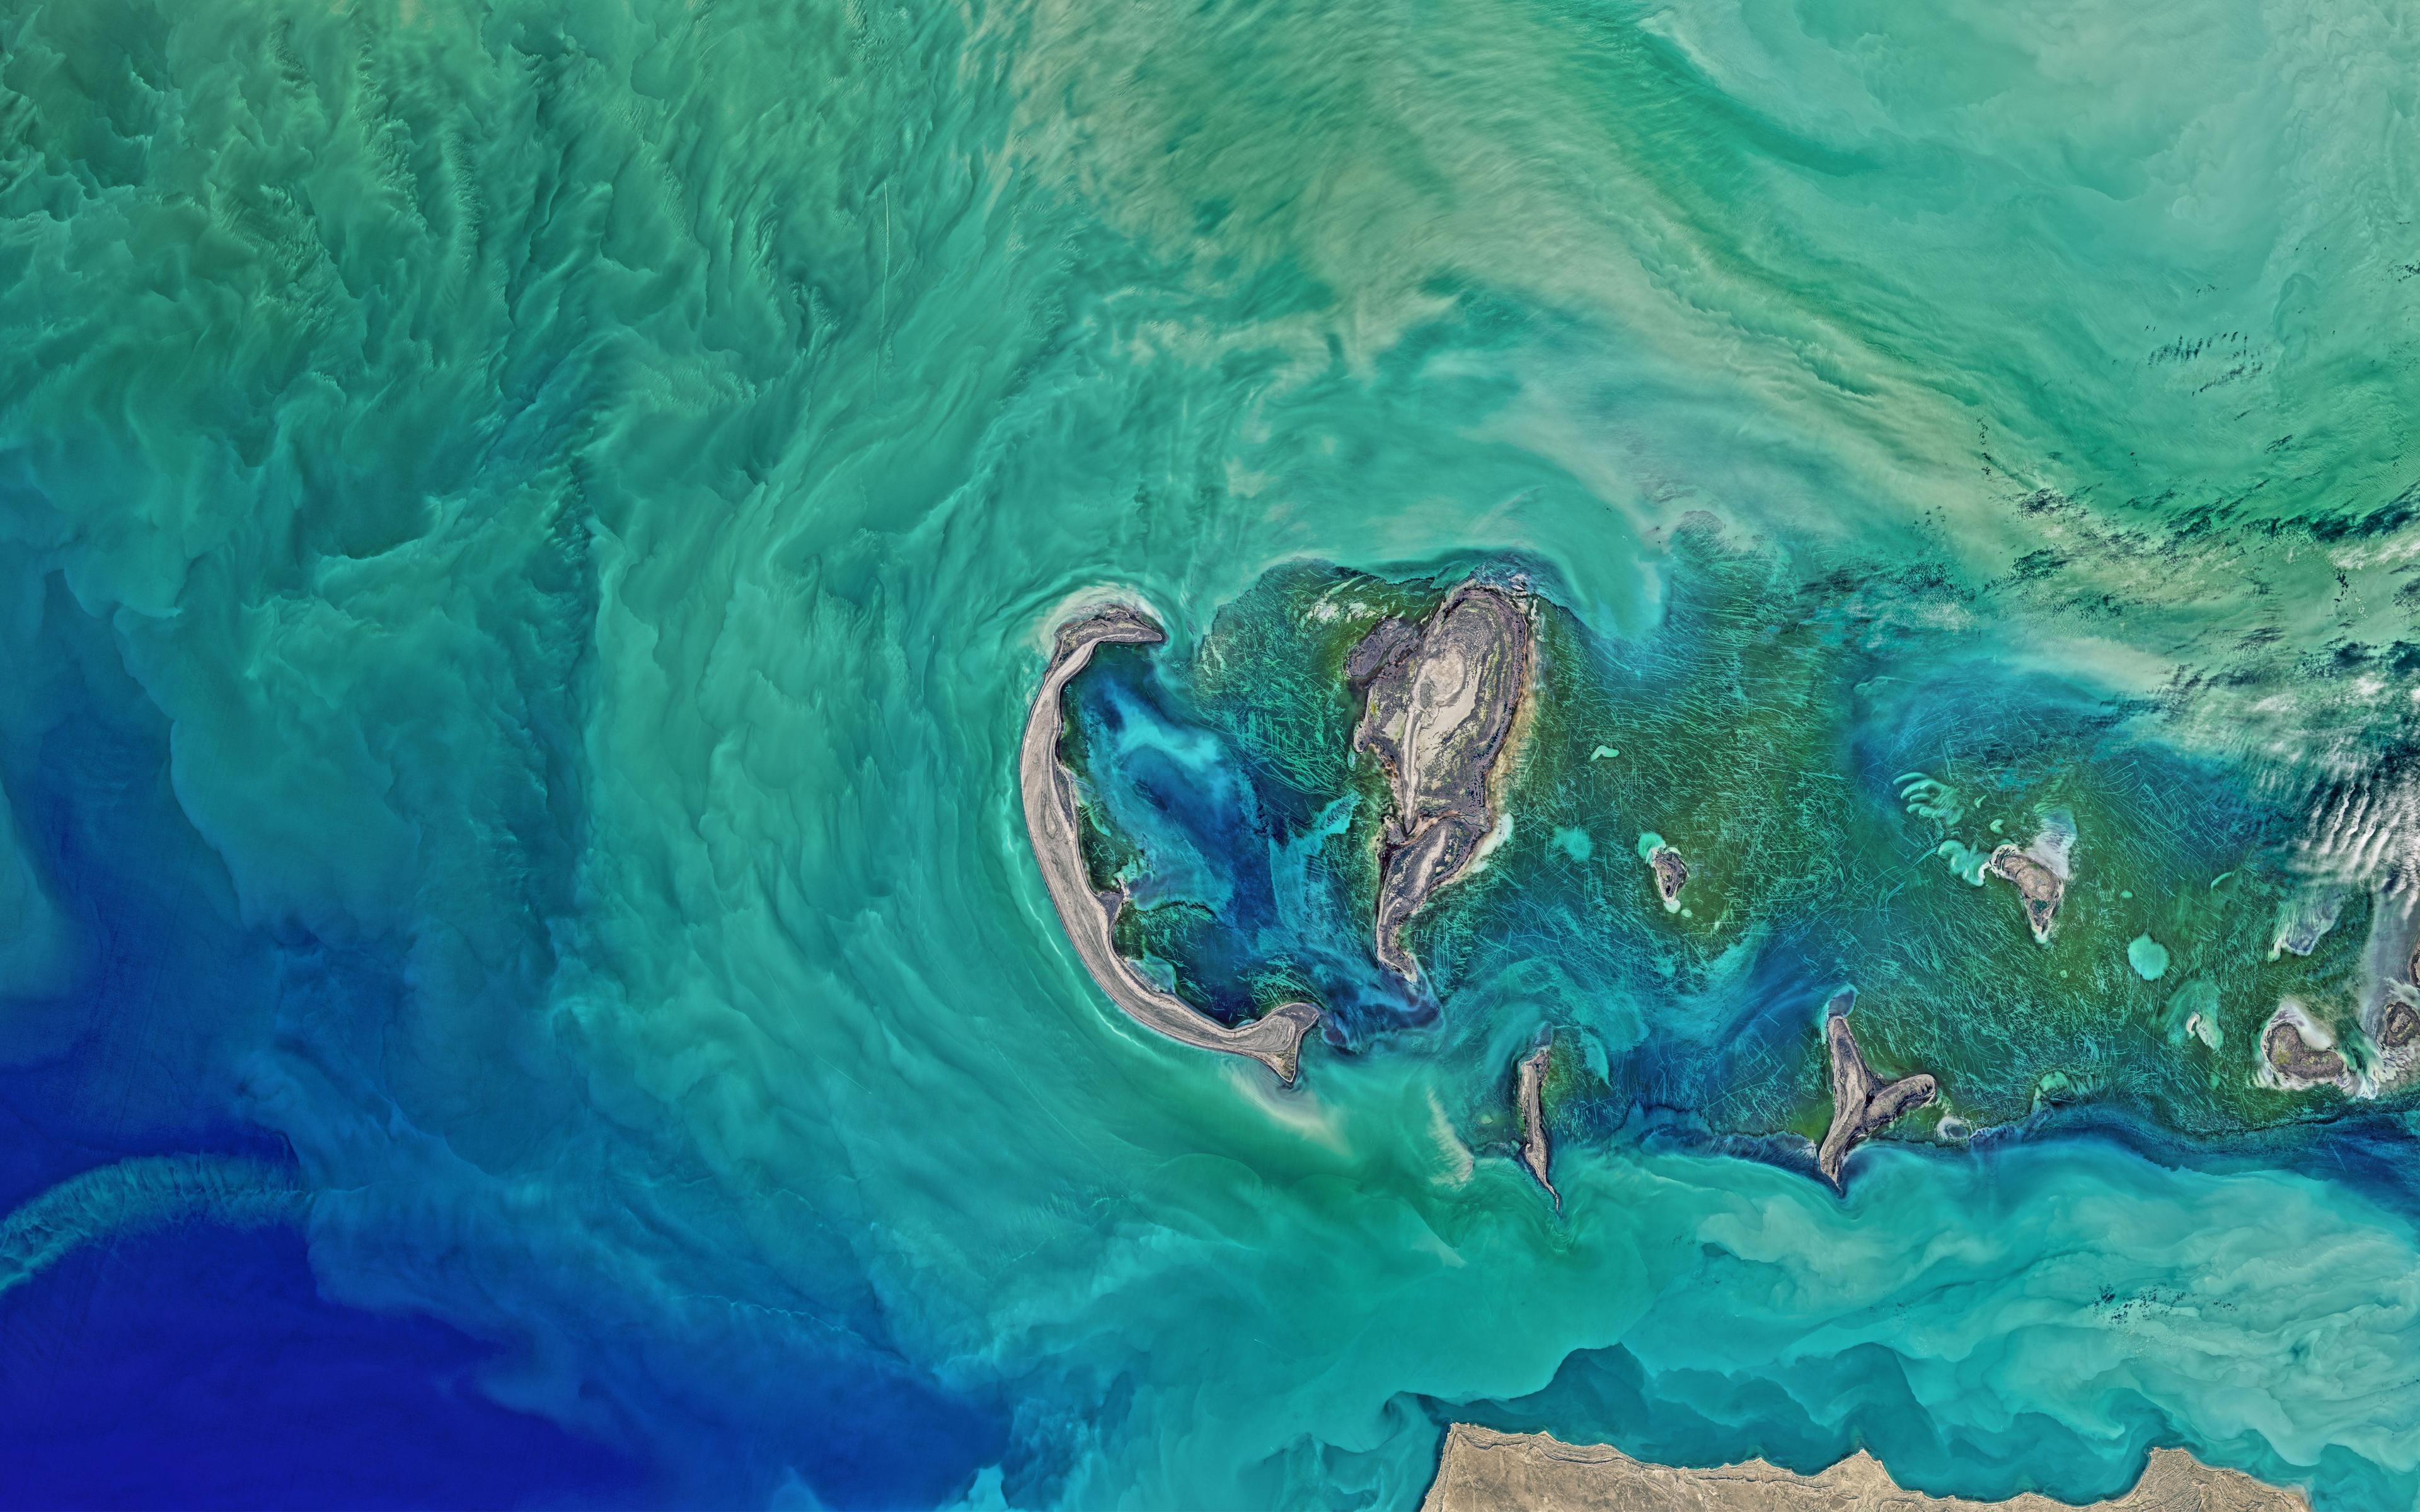 Wallpaper 4k North Caspian Sea Nasa 4k 8k Caspian Earth